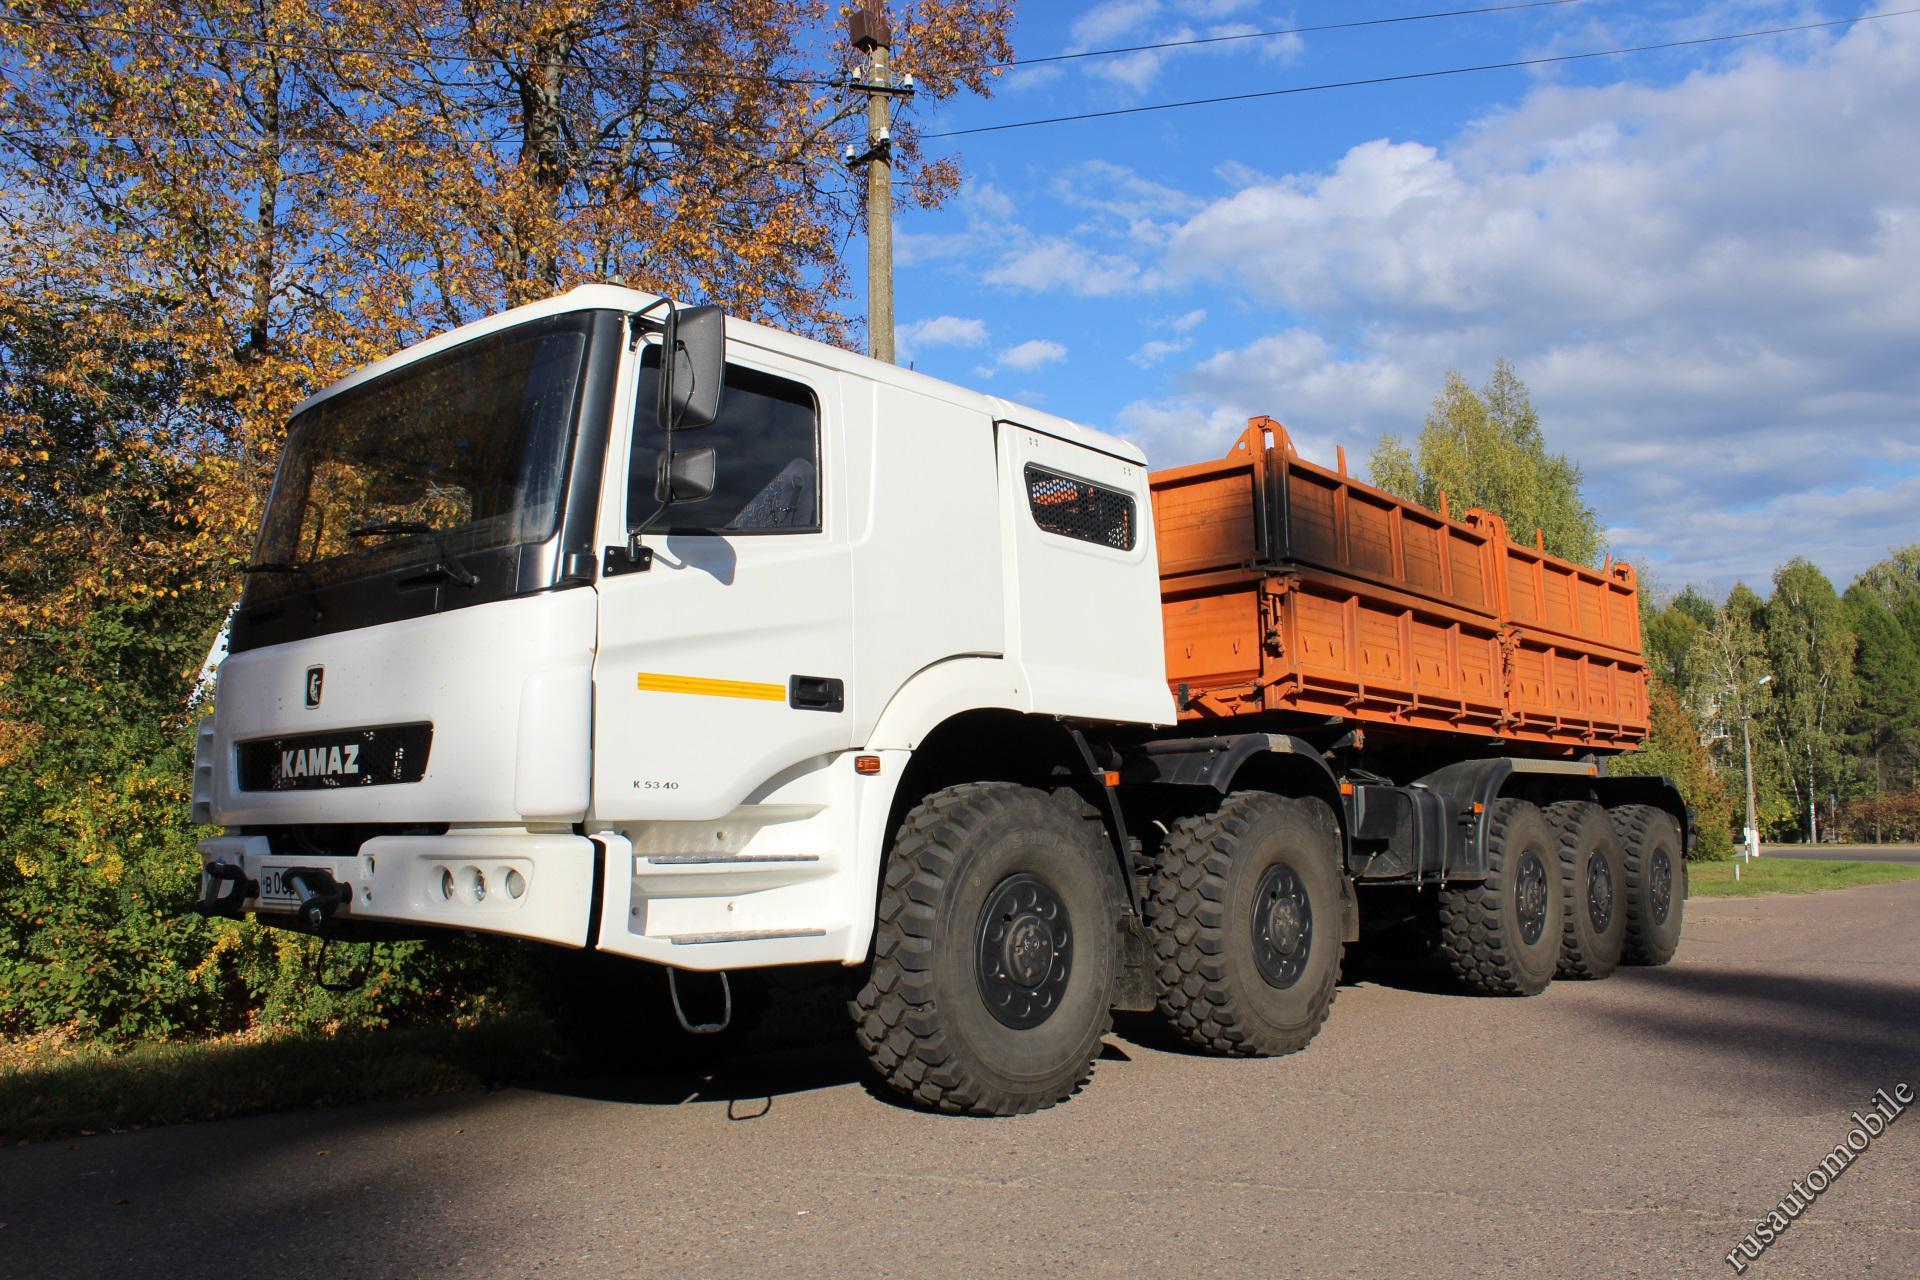 G Mercedes 2019 >> KamAZ K5340 (7360) (Special vehicles) - Trucksplanet